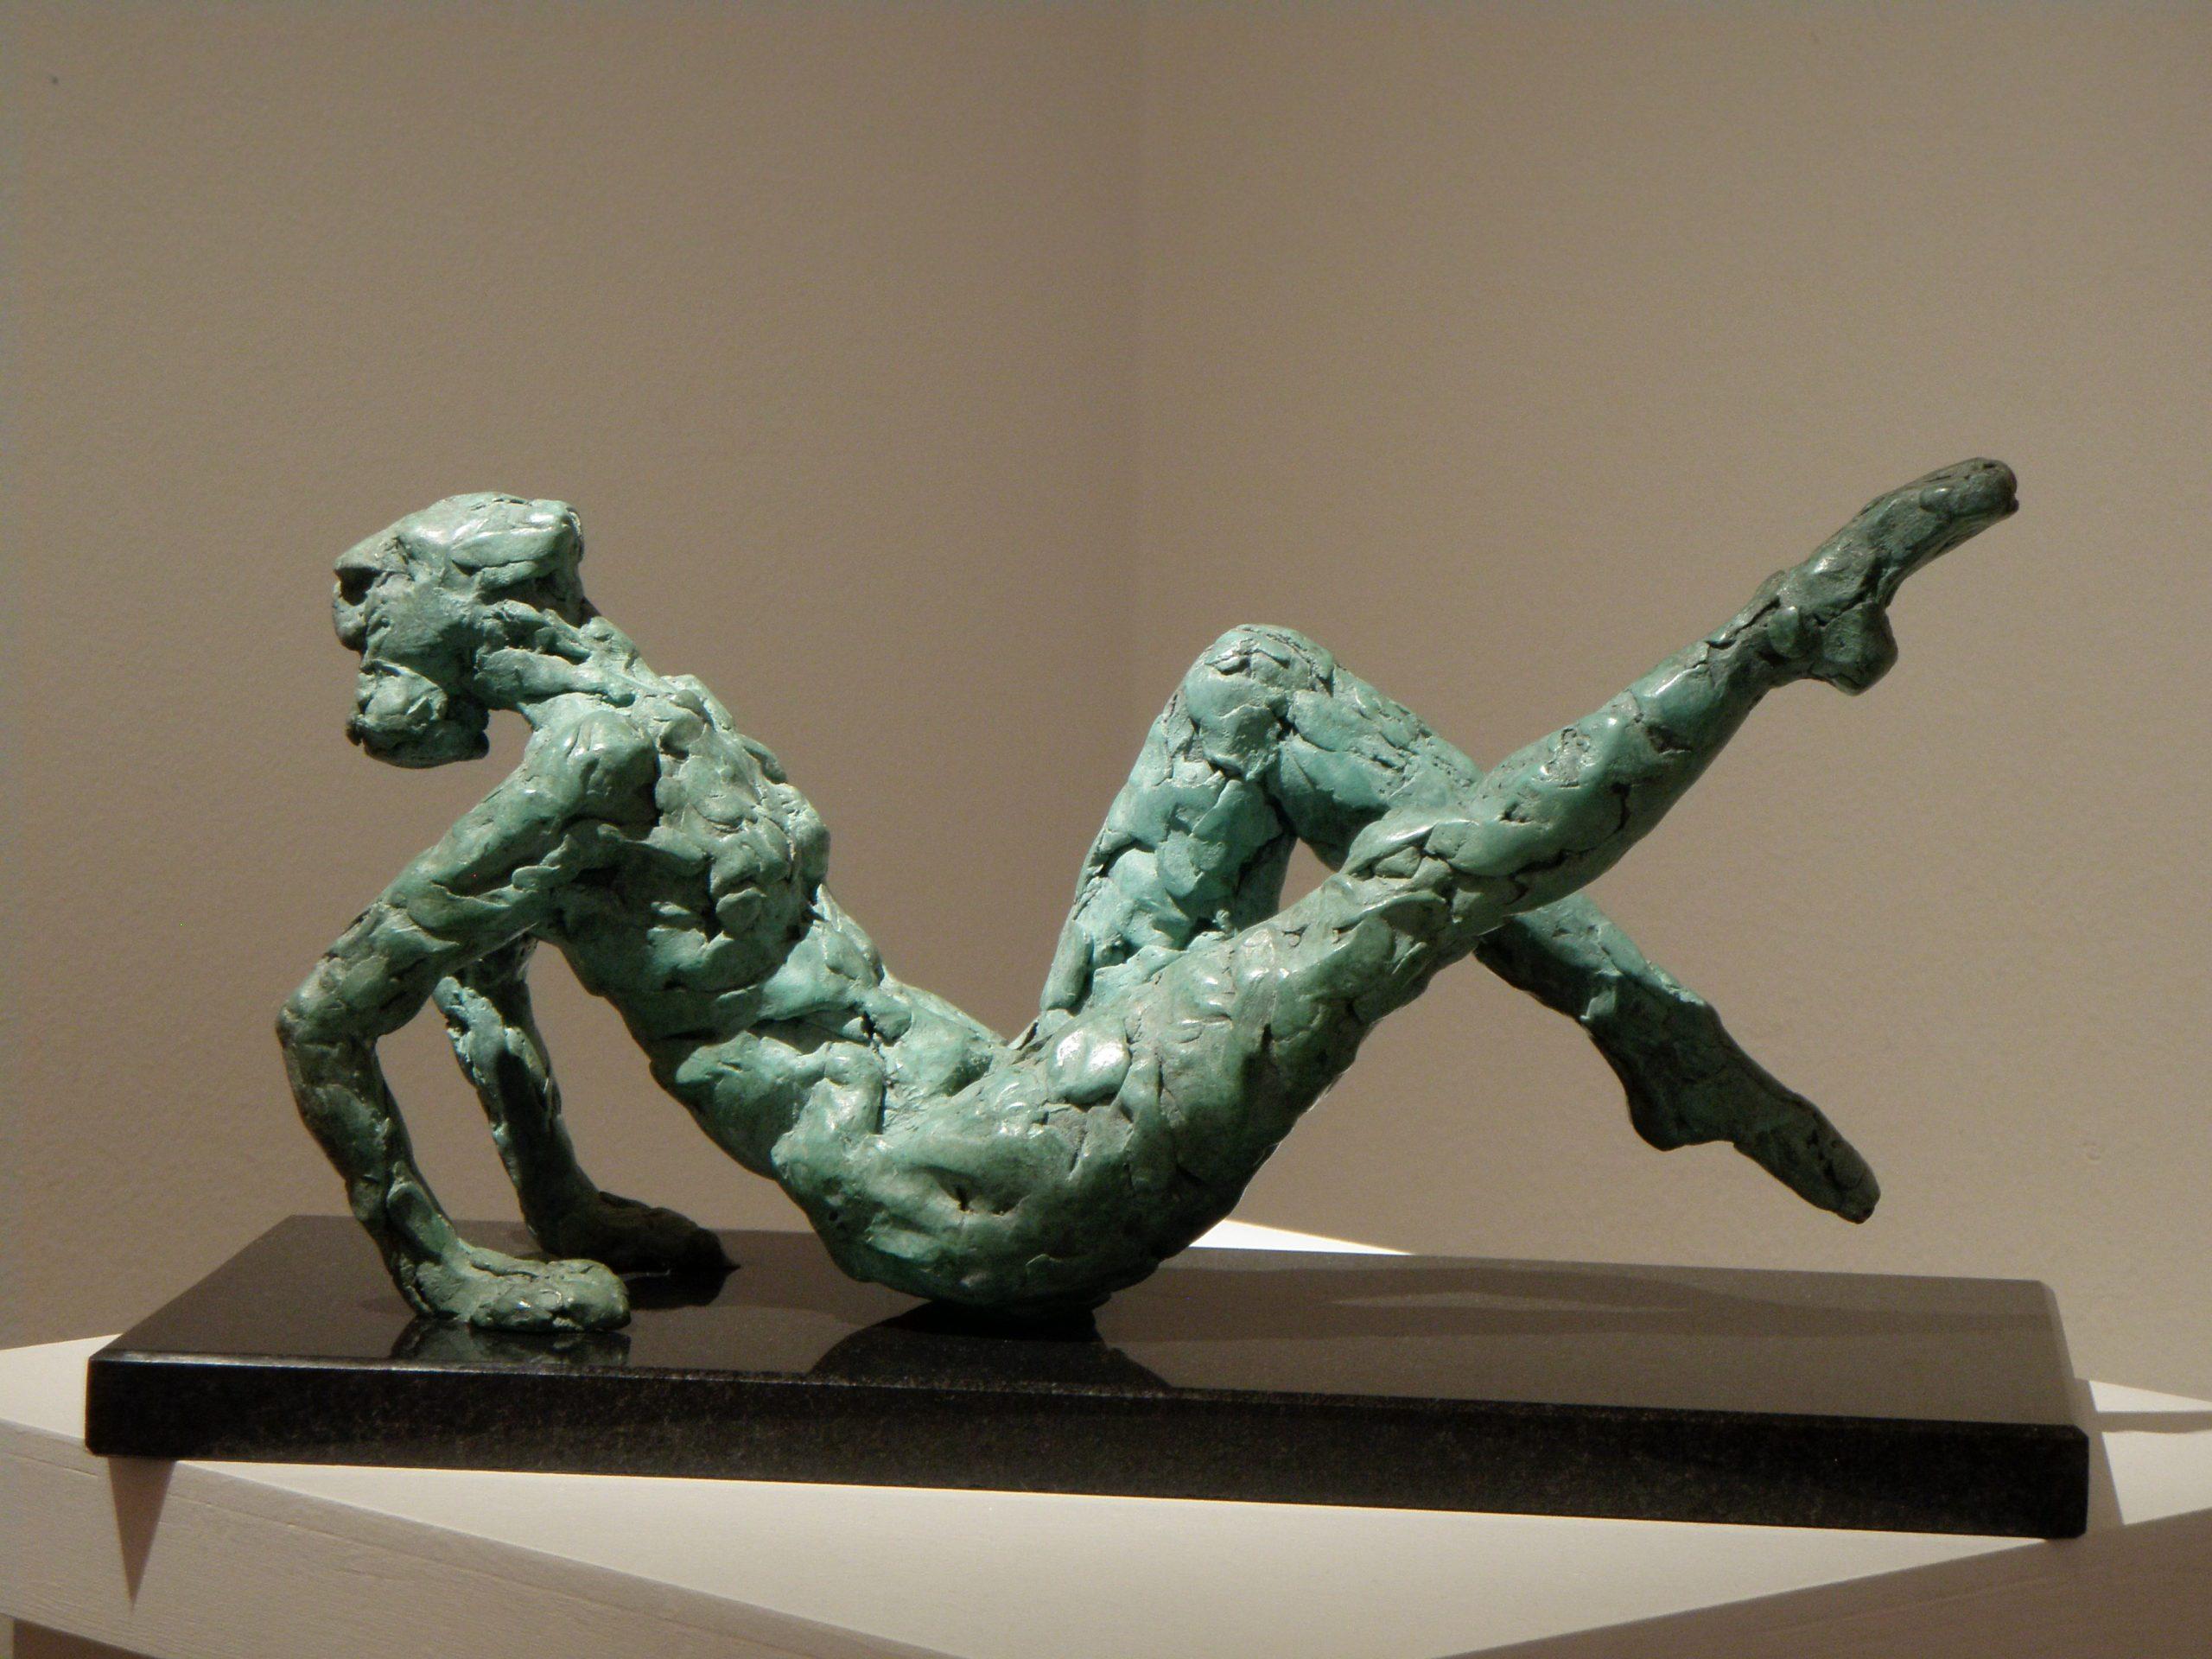 Photo of the bronze dancer in verdigris by sculptor Hazel Reeves